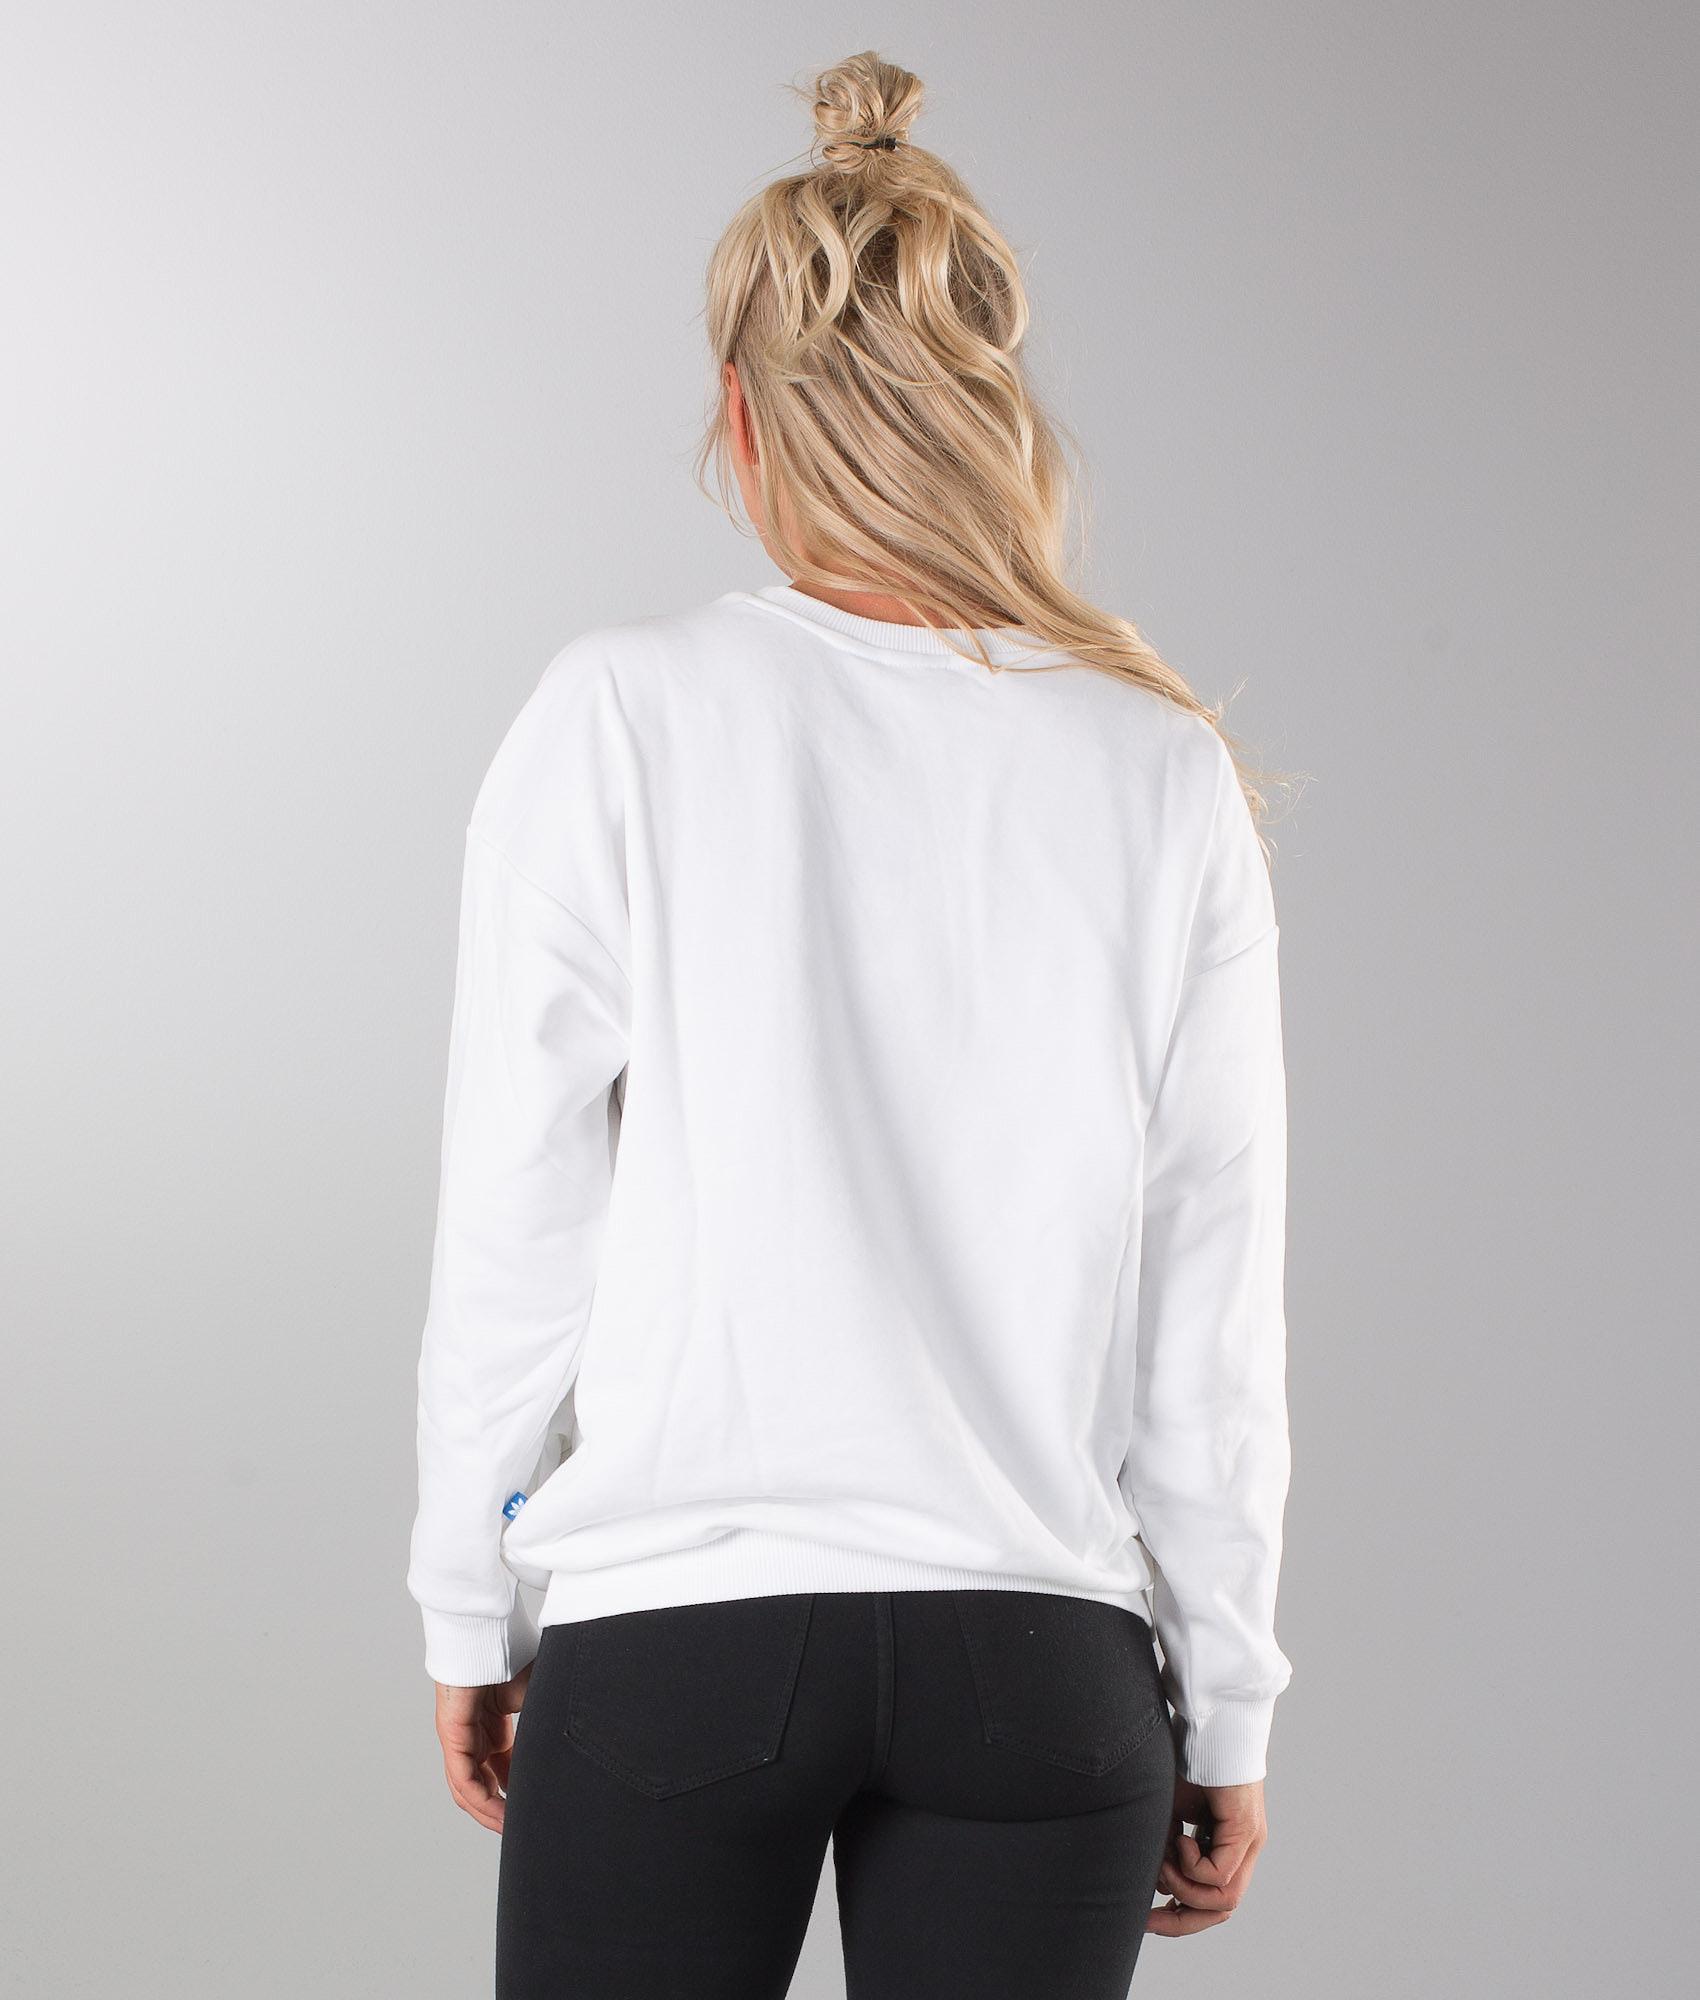 Adidas Originals Trefoil Sweat Sweater White - Ridestore.com 8b15b91987a